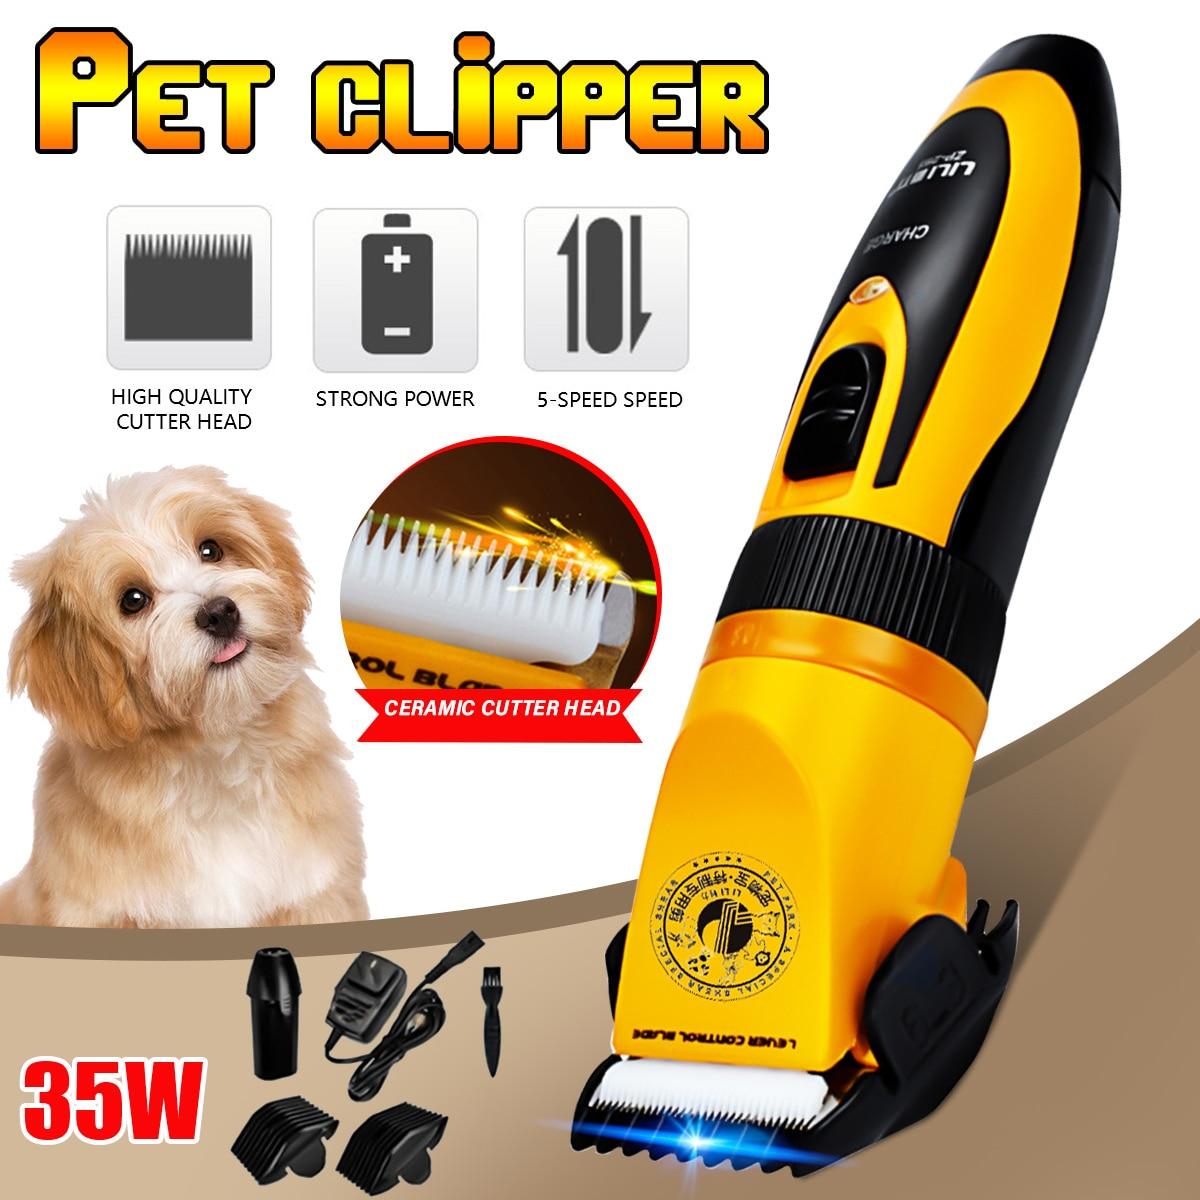 LILI-ماكينة تشذيب شعر الحيوانات الأليفة الاحترافية ، ماكينة حلاقة كهربائية بدون صوت ، قابلة لإعادة الشحن ، لقص شعر الكلاب والقطط ، 35 واط